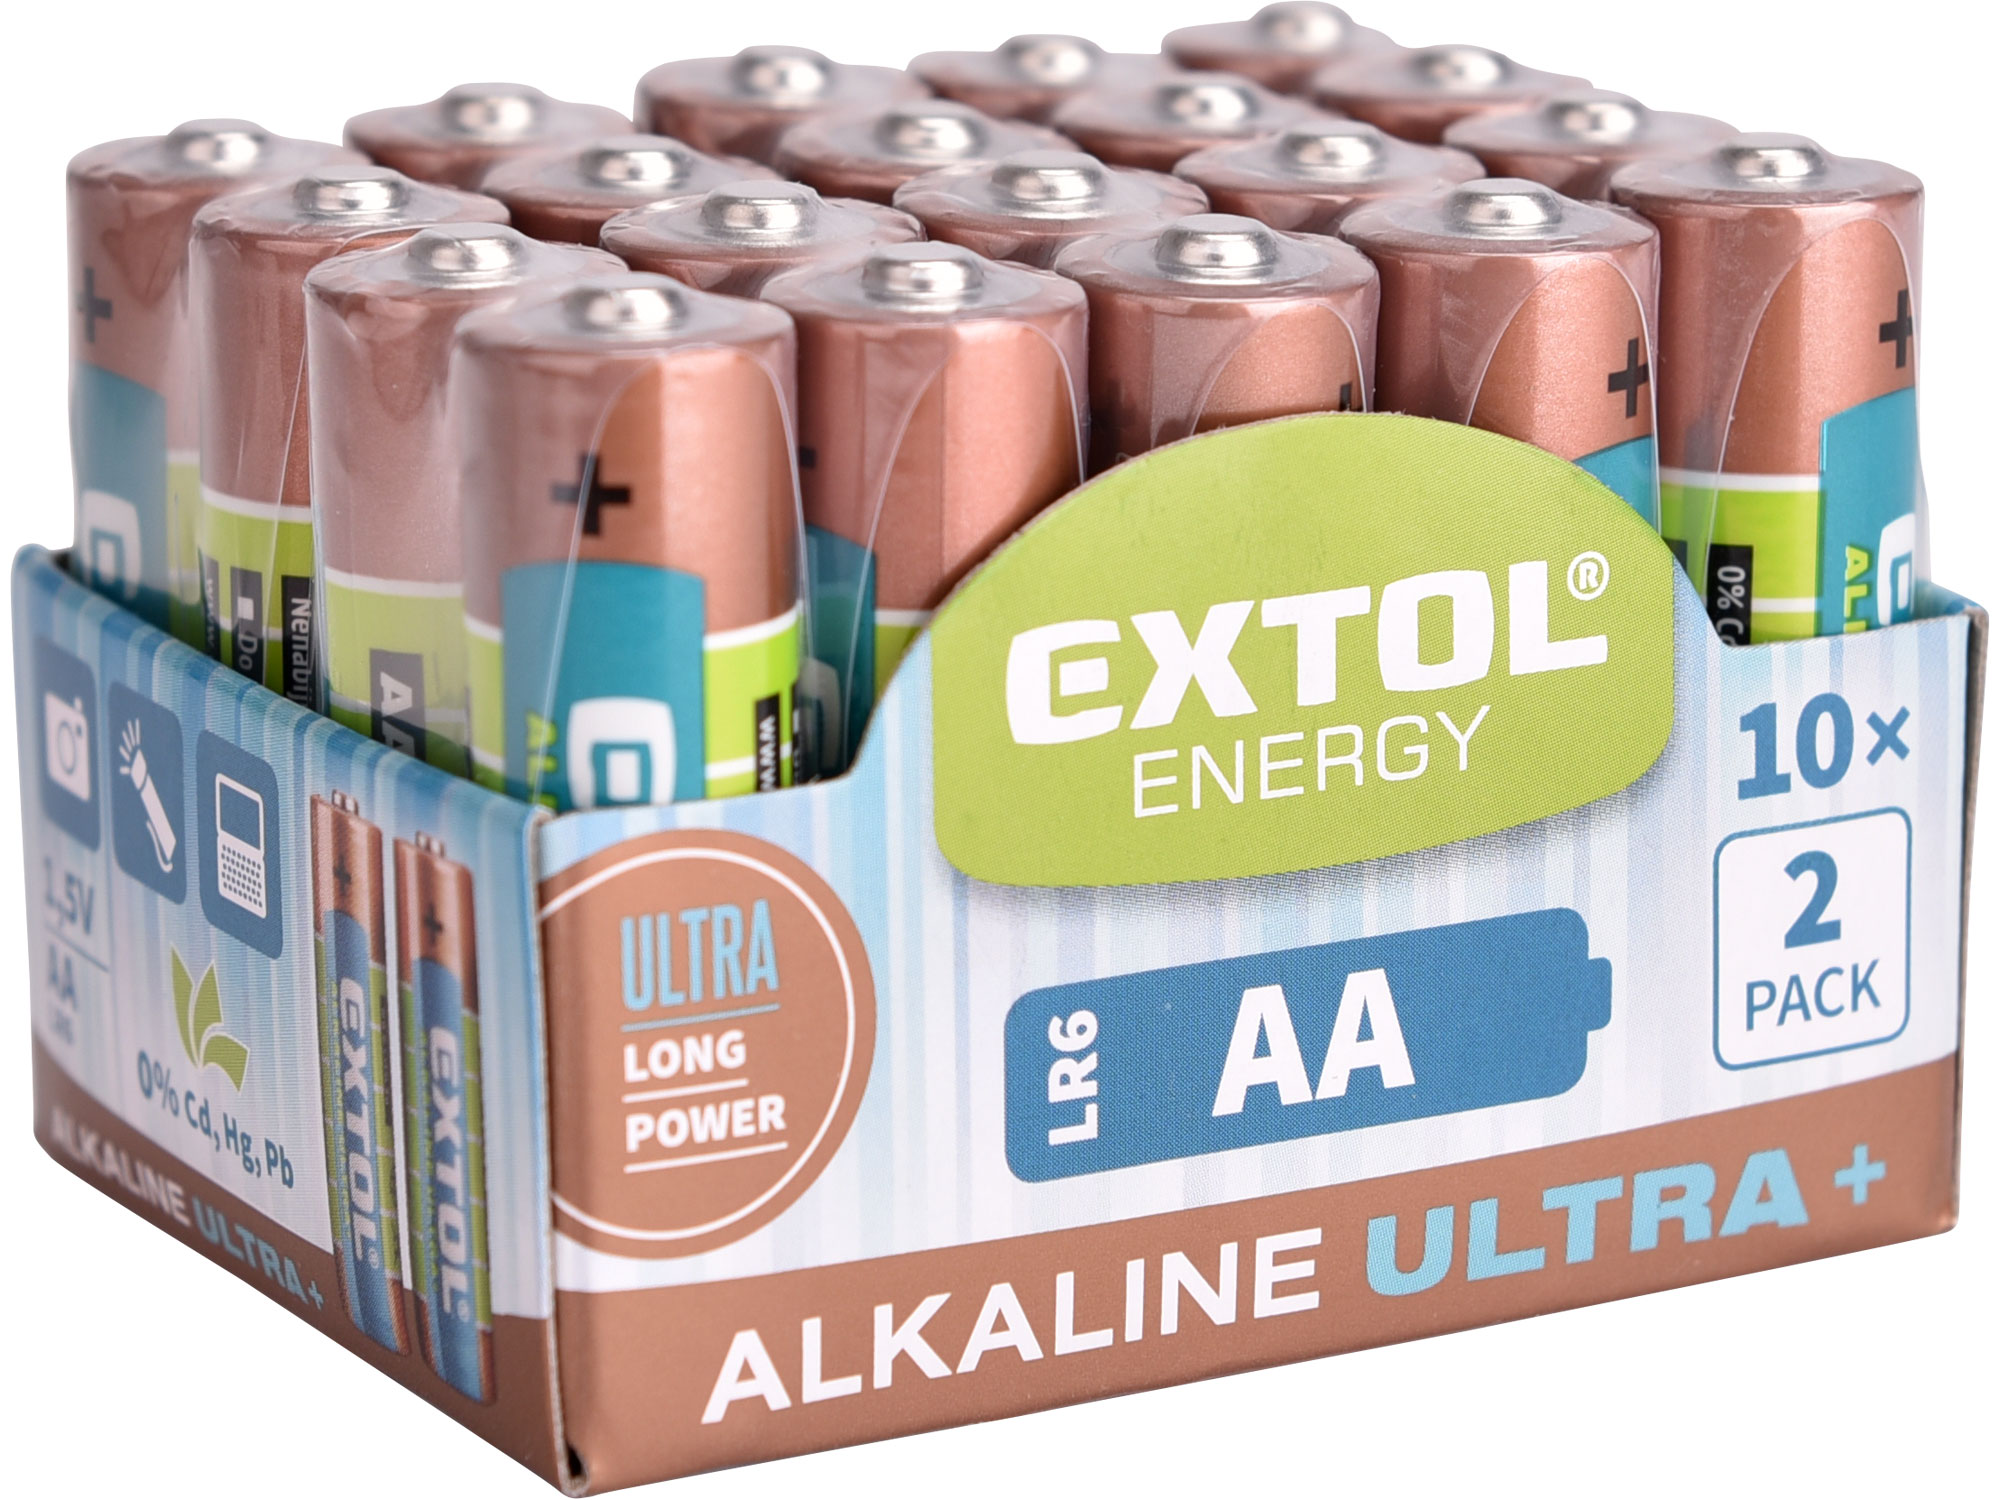 Baterie alkalické, 20 ks, 1,5V AA (LR6) EXTOL ENERGY 42013